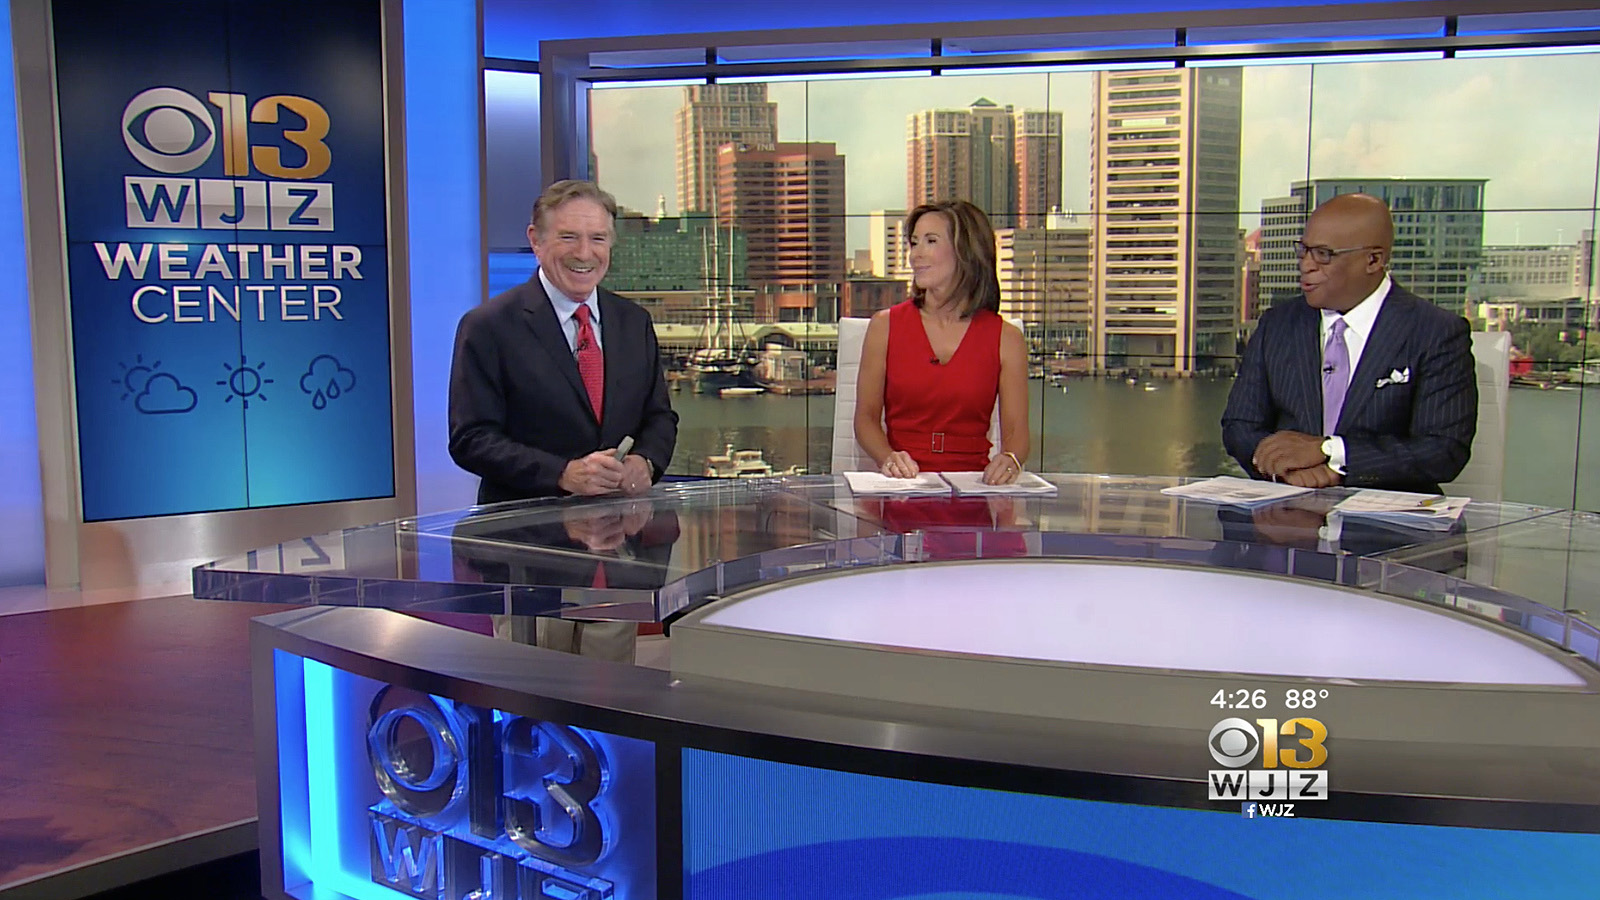 ncs_WJZ-CBS-13-Baltimore-TV-Studio_0002